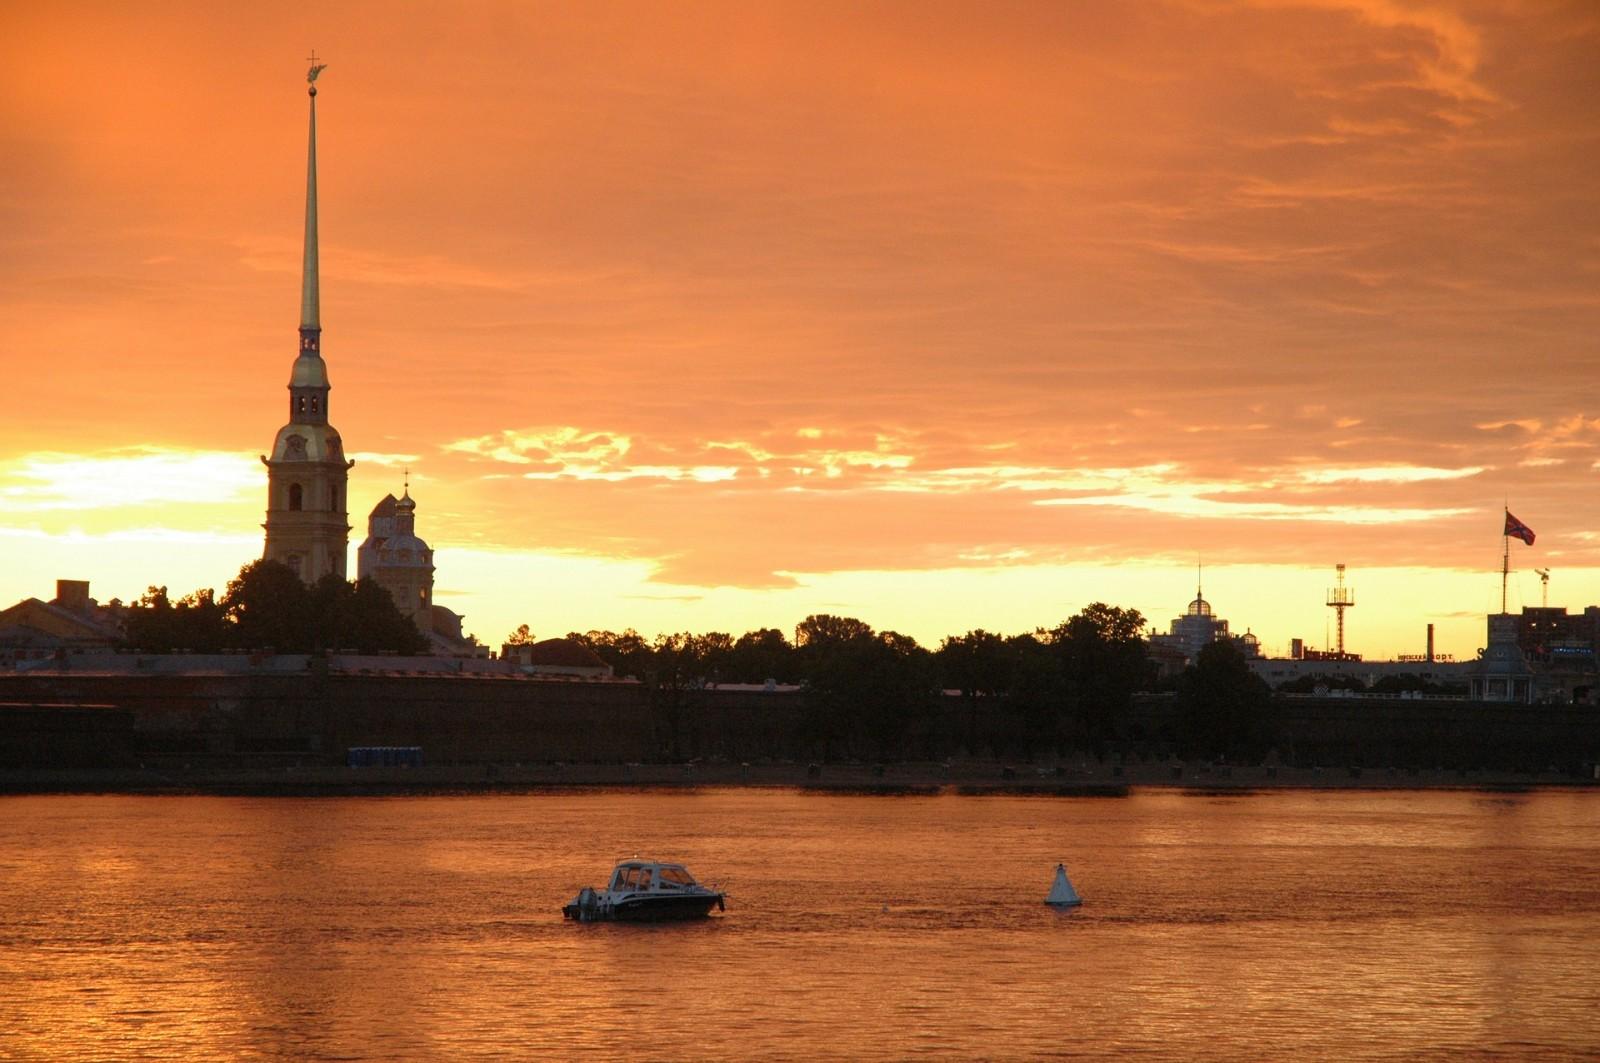 St. petersburg, Russia, Pixabay.com